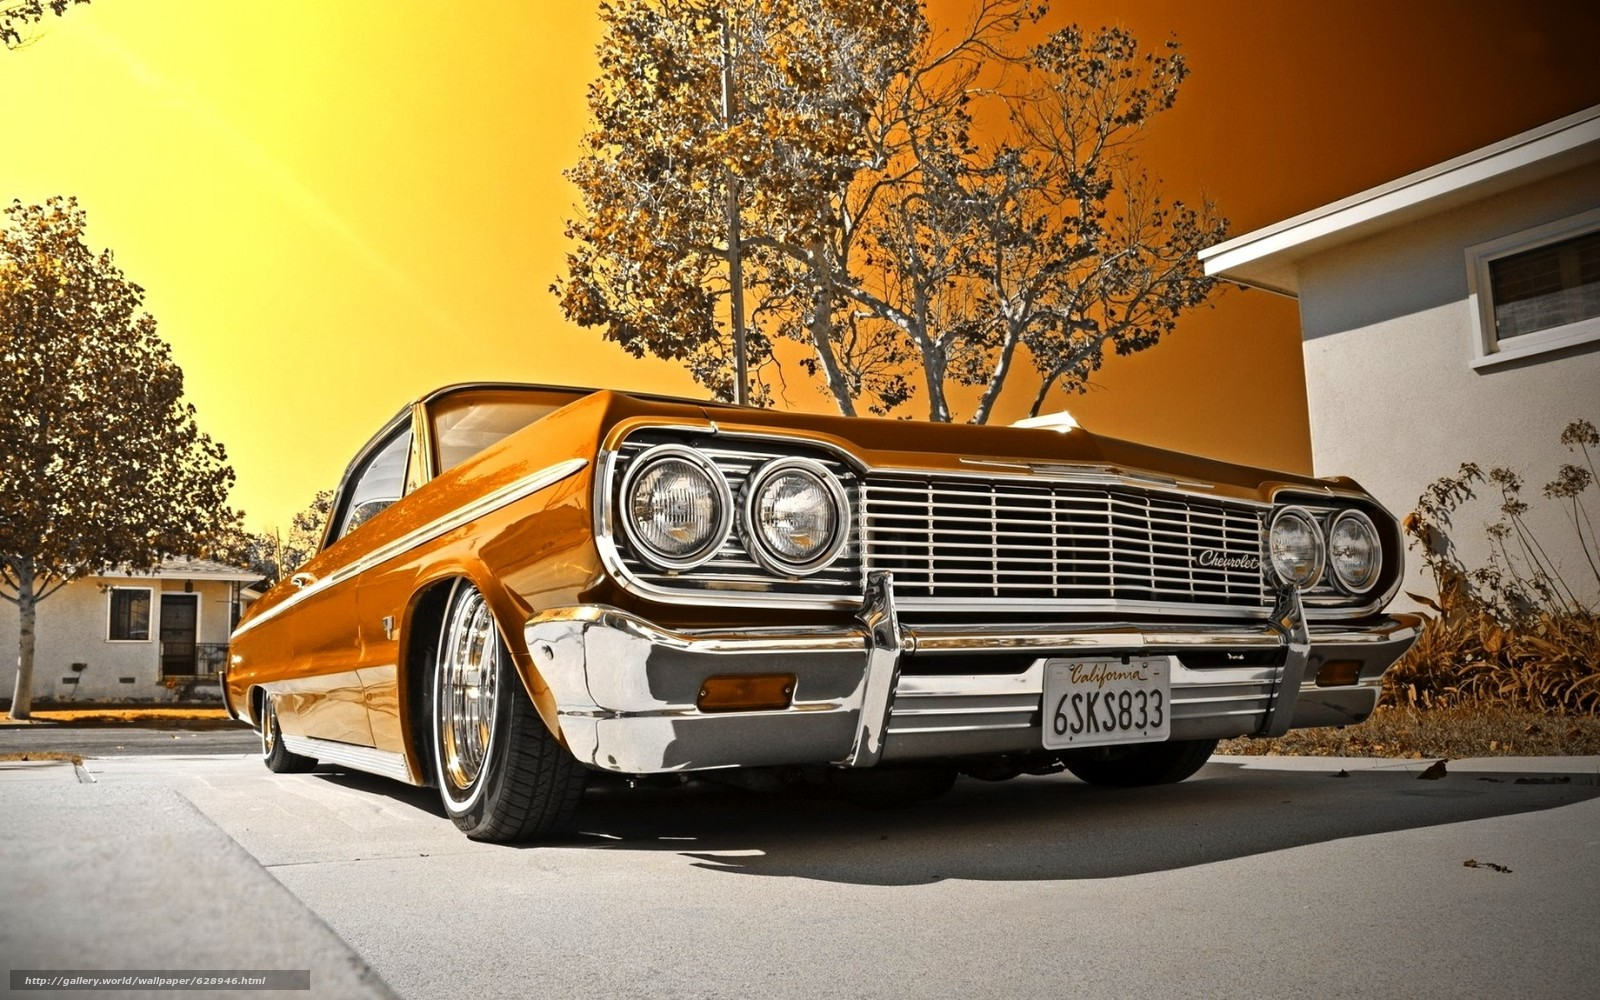 1964, Chevrolet, Impala, Convertible, Lowrider, шевроле, импала